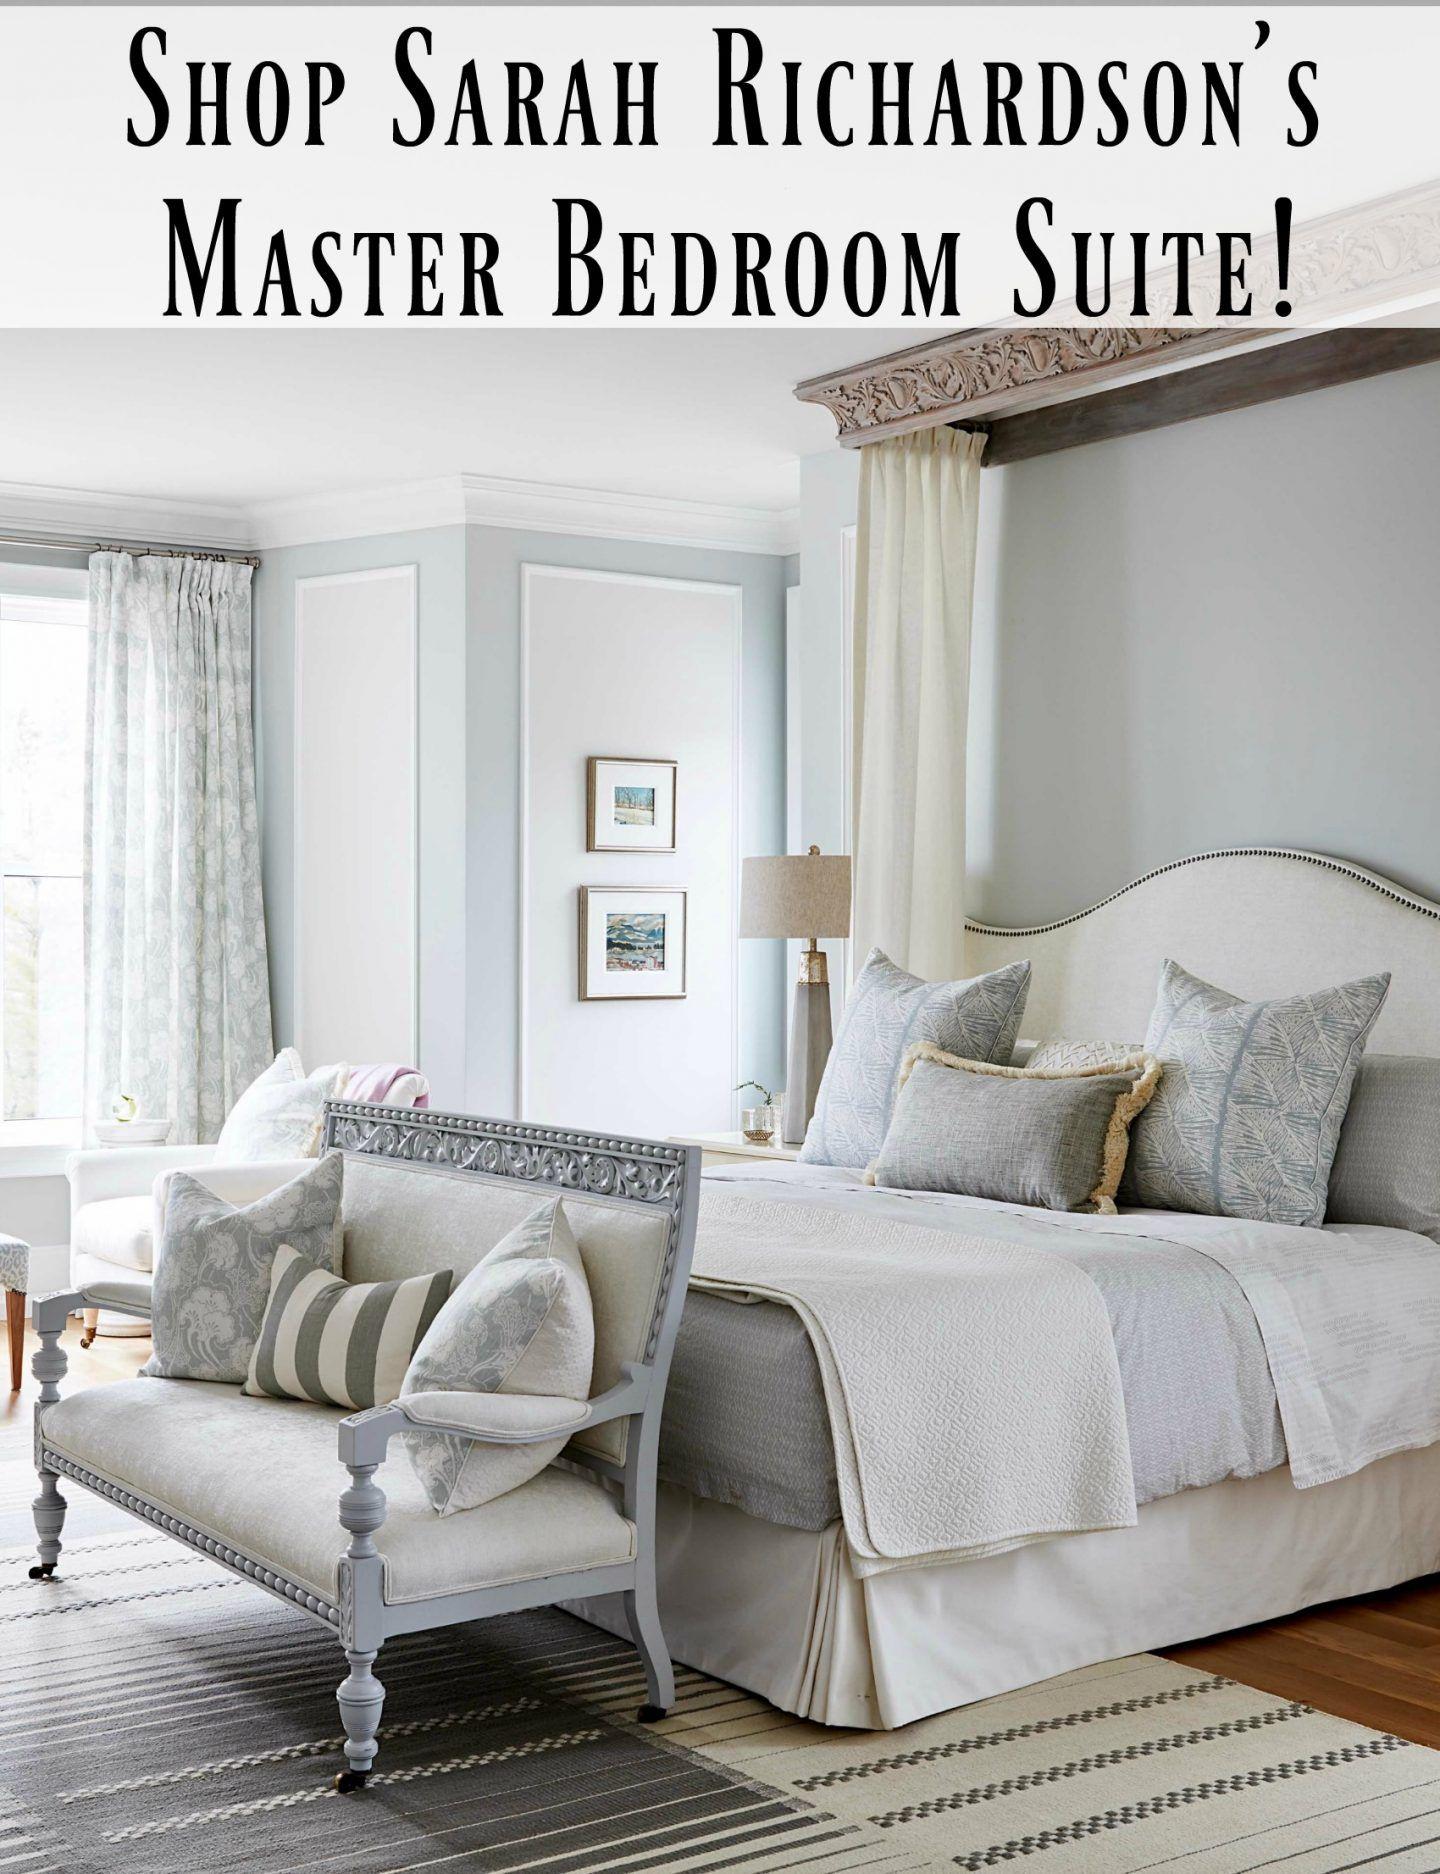 Master bedroom suite decor  Get the Look Sarah Richardson Master Bedroom  Home design